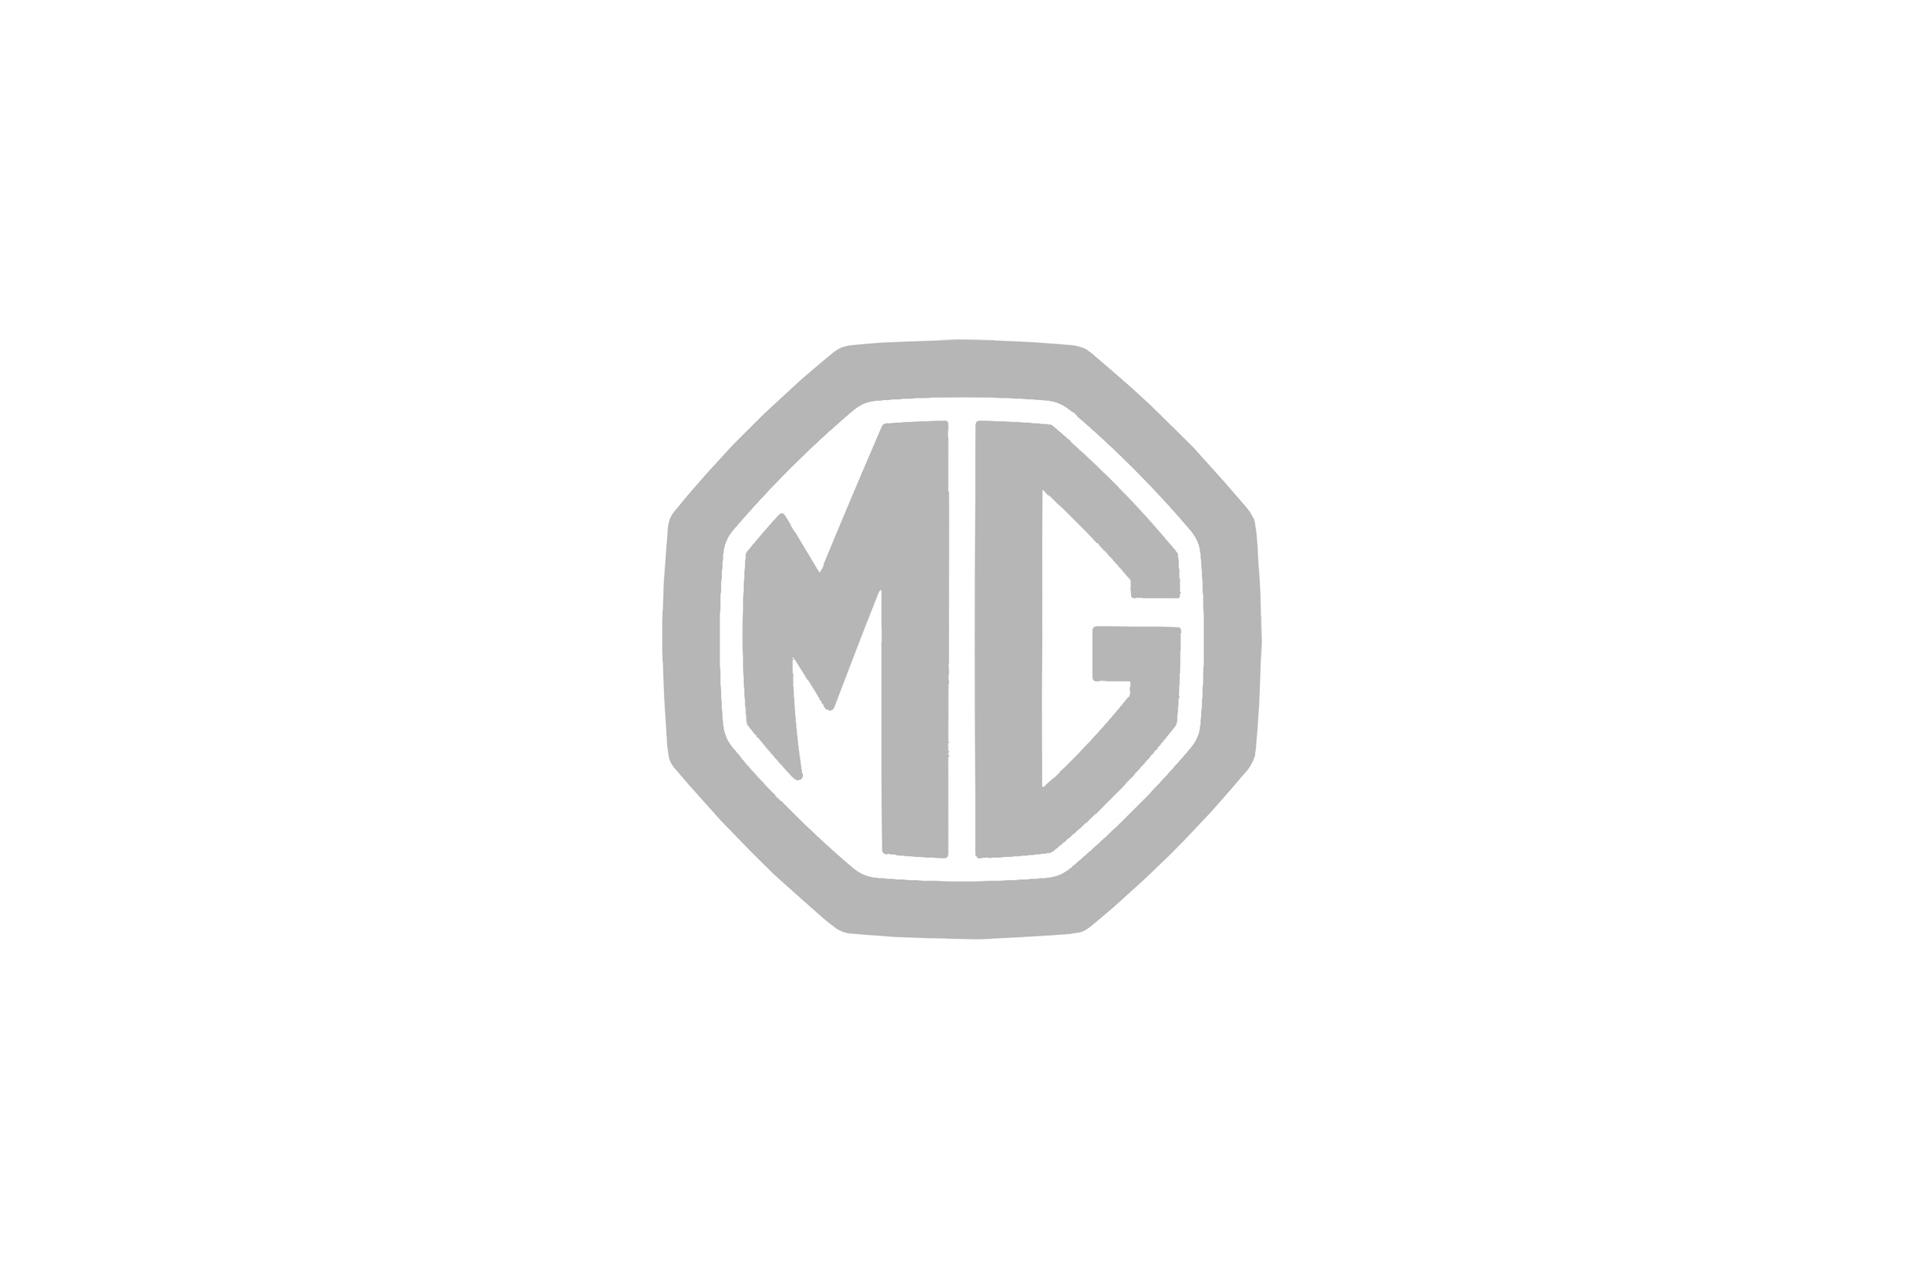 MG logo grey